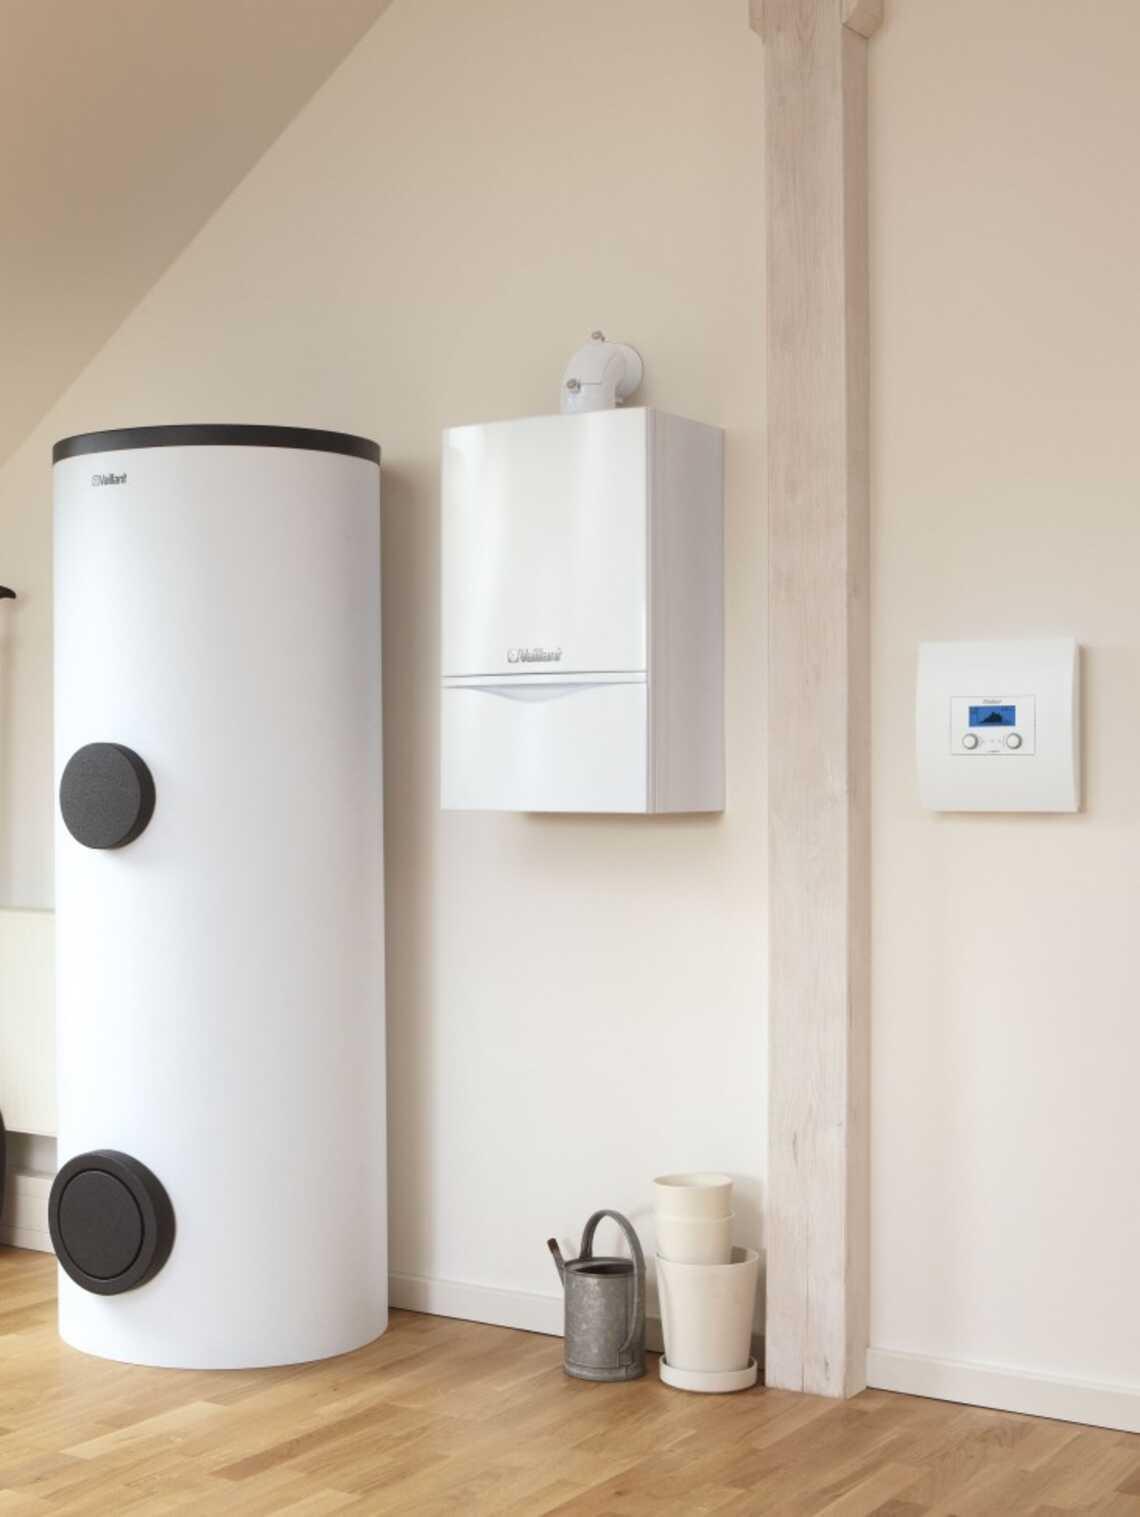 solarspeicher aurostor vih s 300 500 vaillant. Black Bedroom Furniture Sets. Home Design Ideas